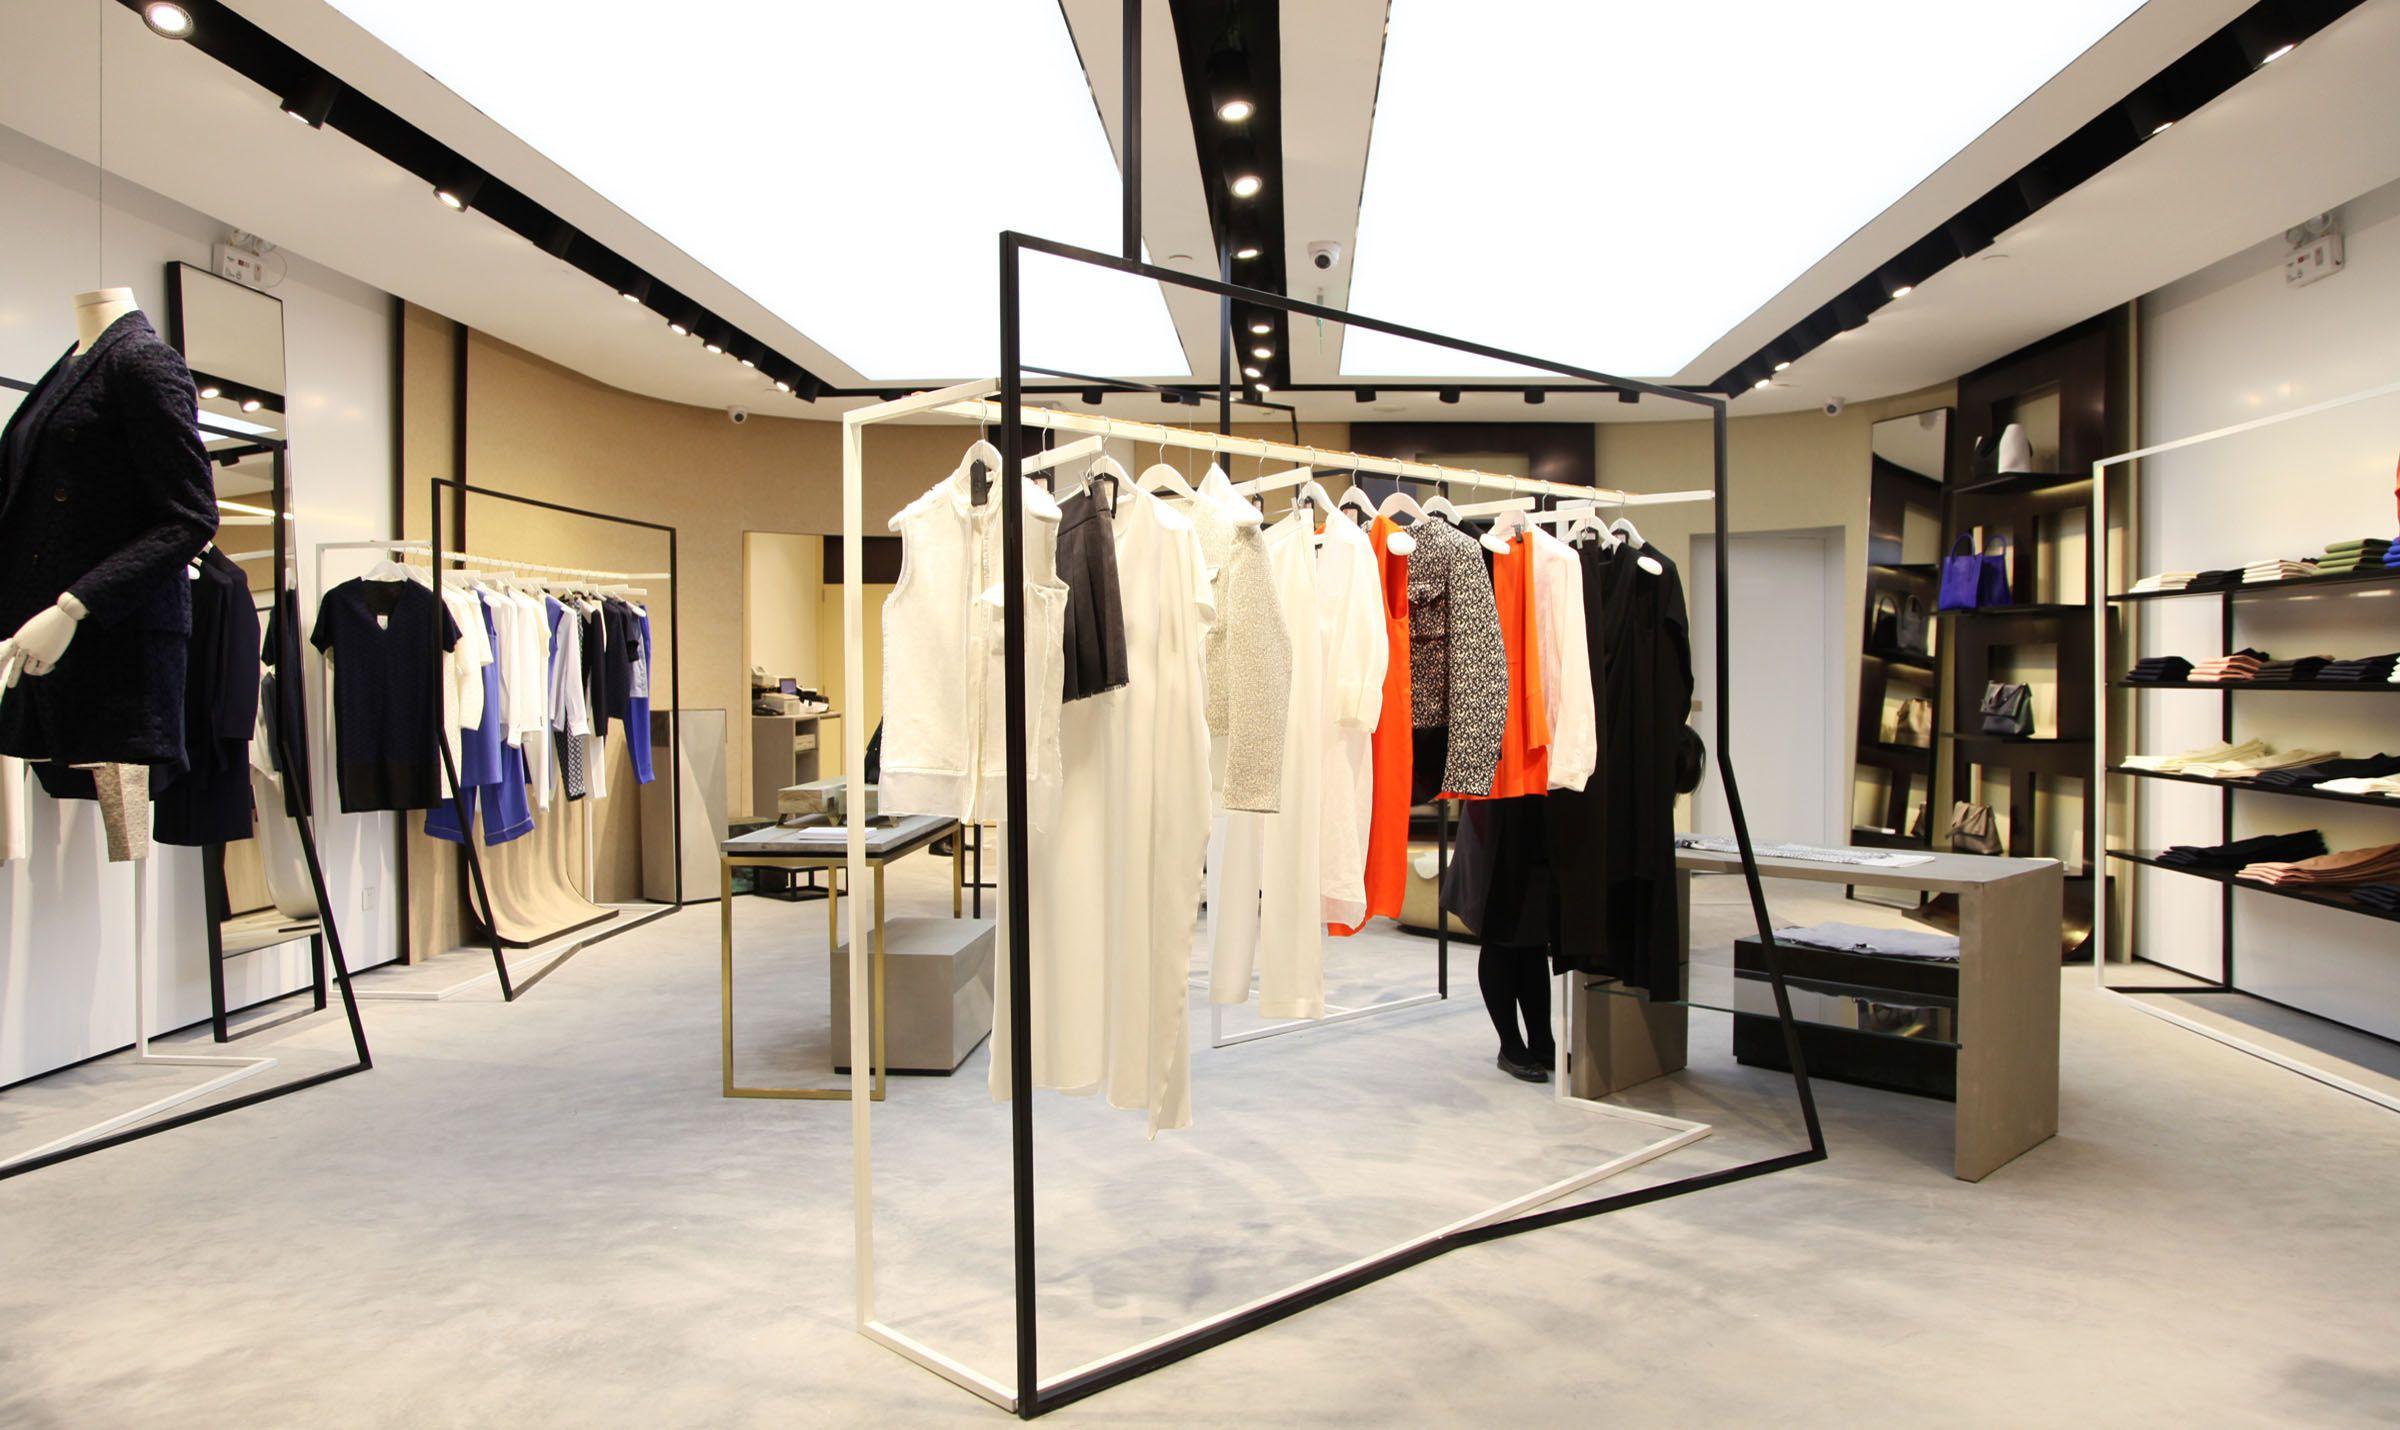 Pin By Allen Hao On Fashion Store Retail Design Store Design